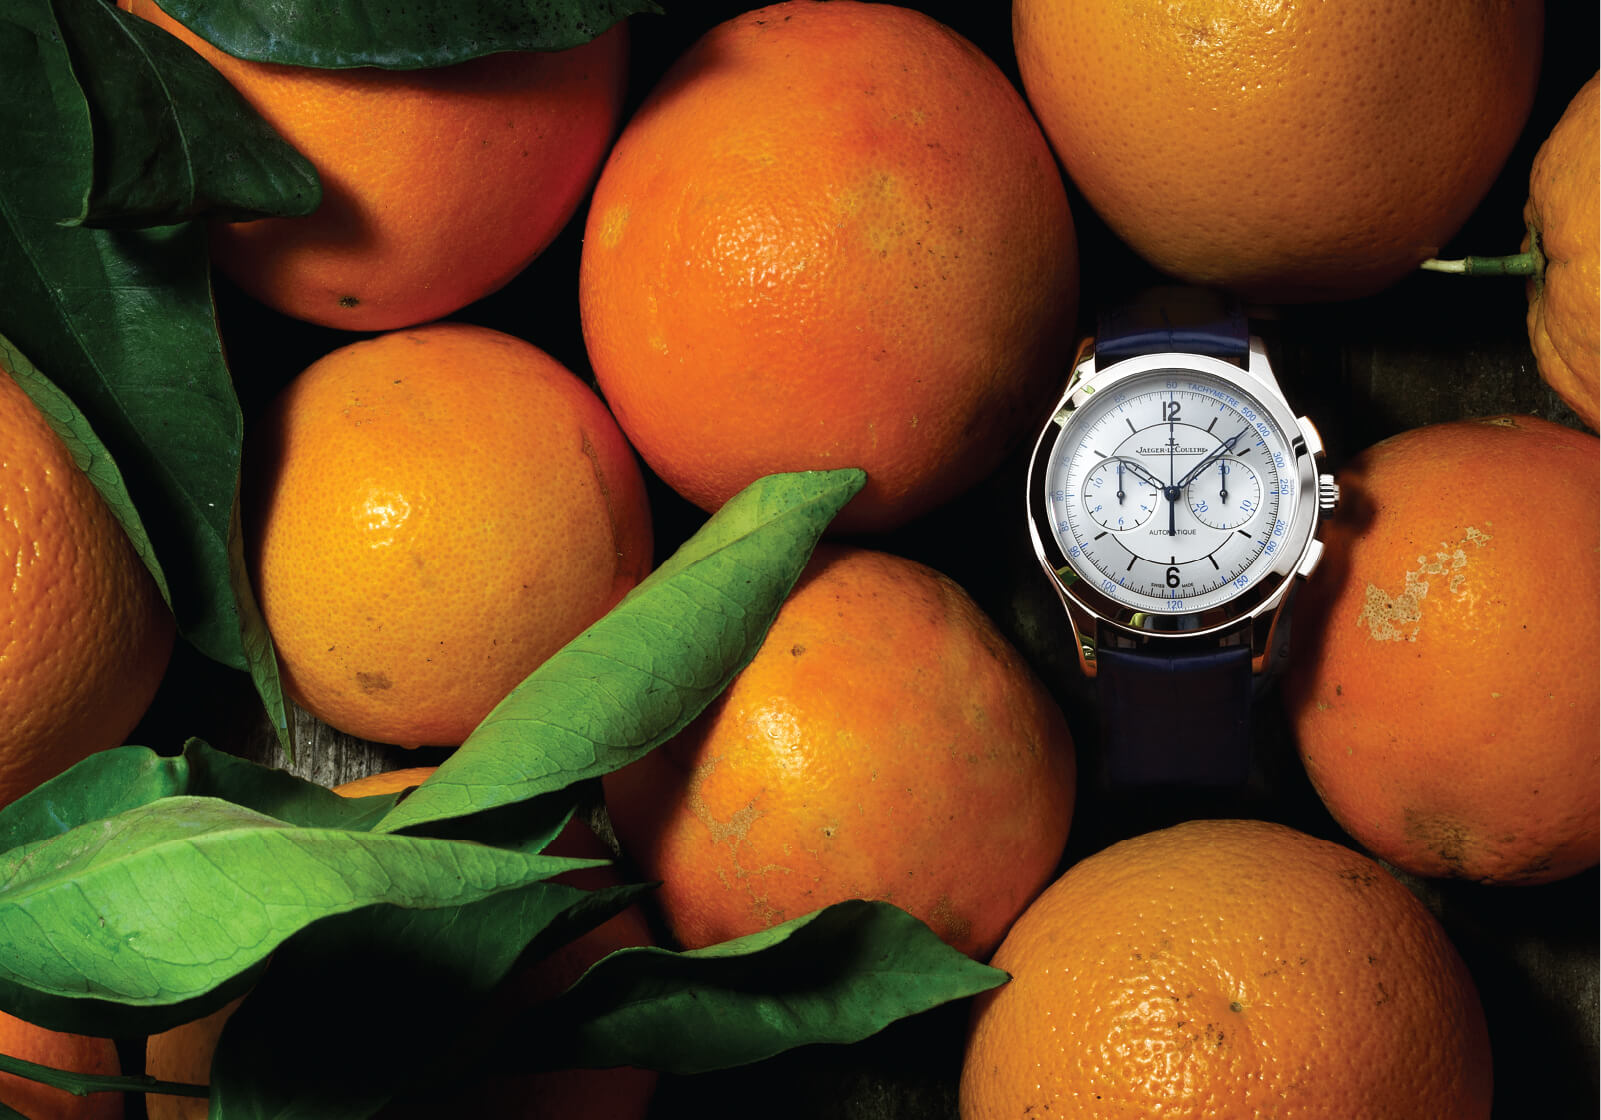 Jaeger-LeCoultre Master Chronograph Ref. Q1538530   Ø40mm sobre fundo de laranjas   © Paulo Pires / Espiral do Tempo